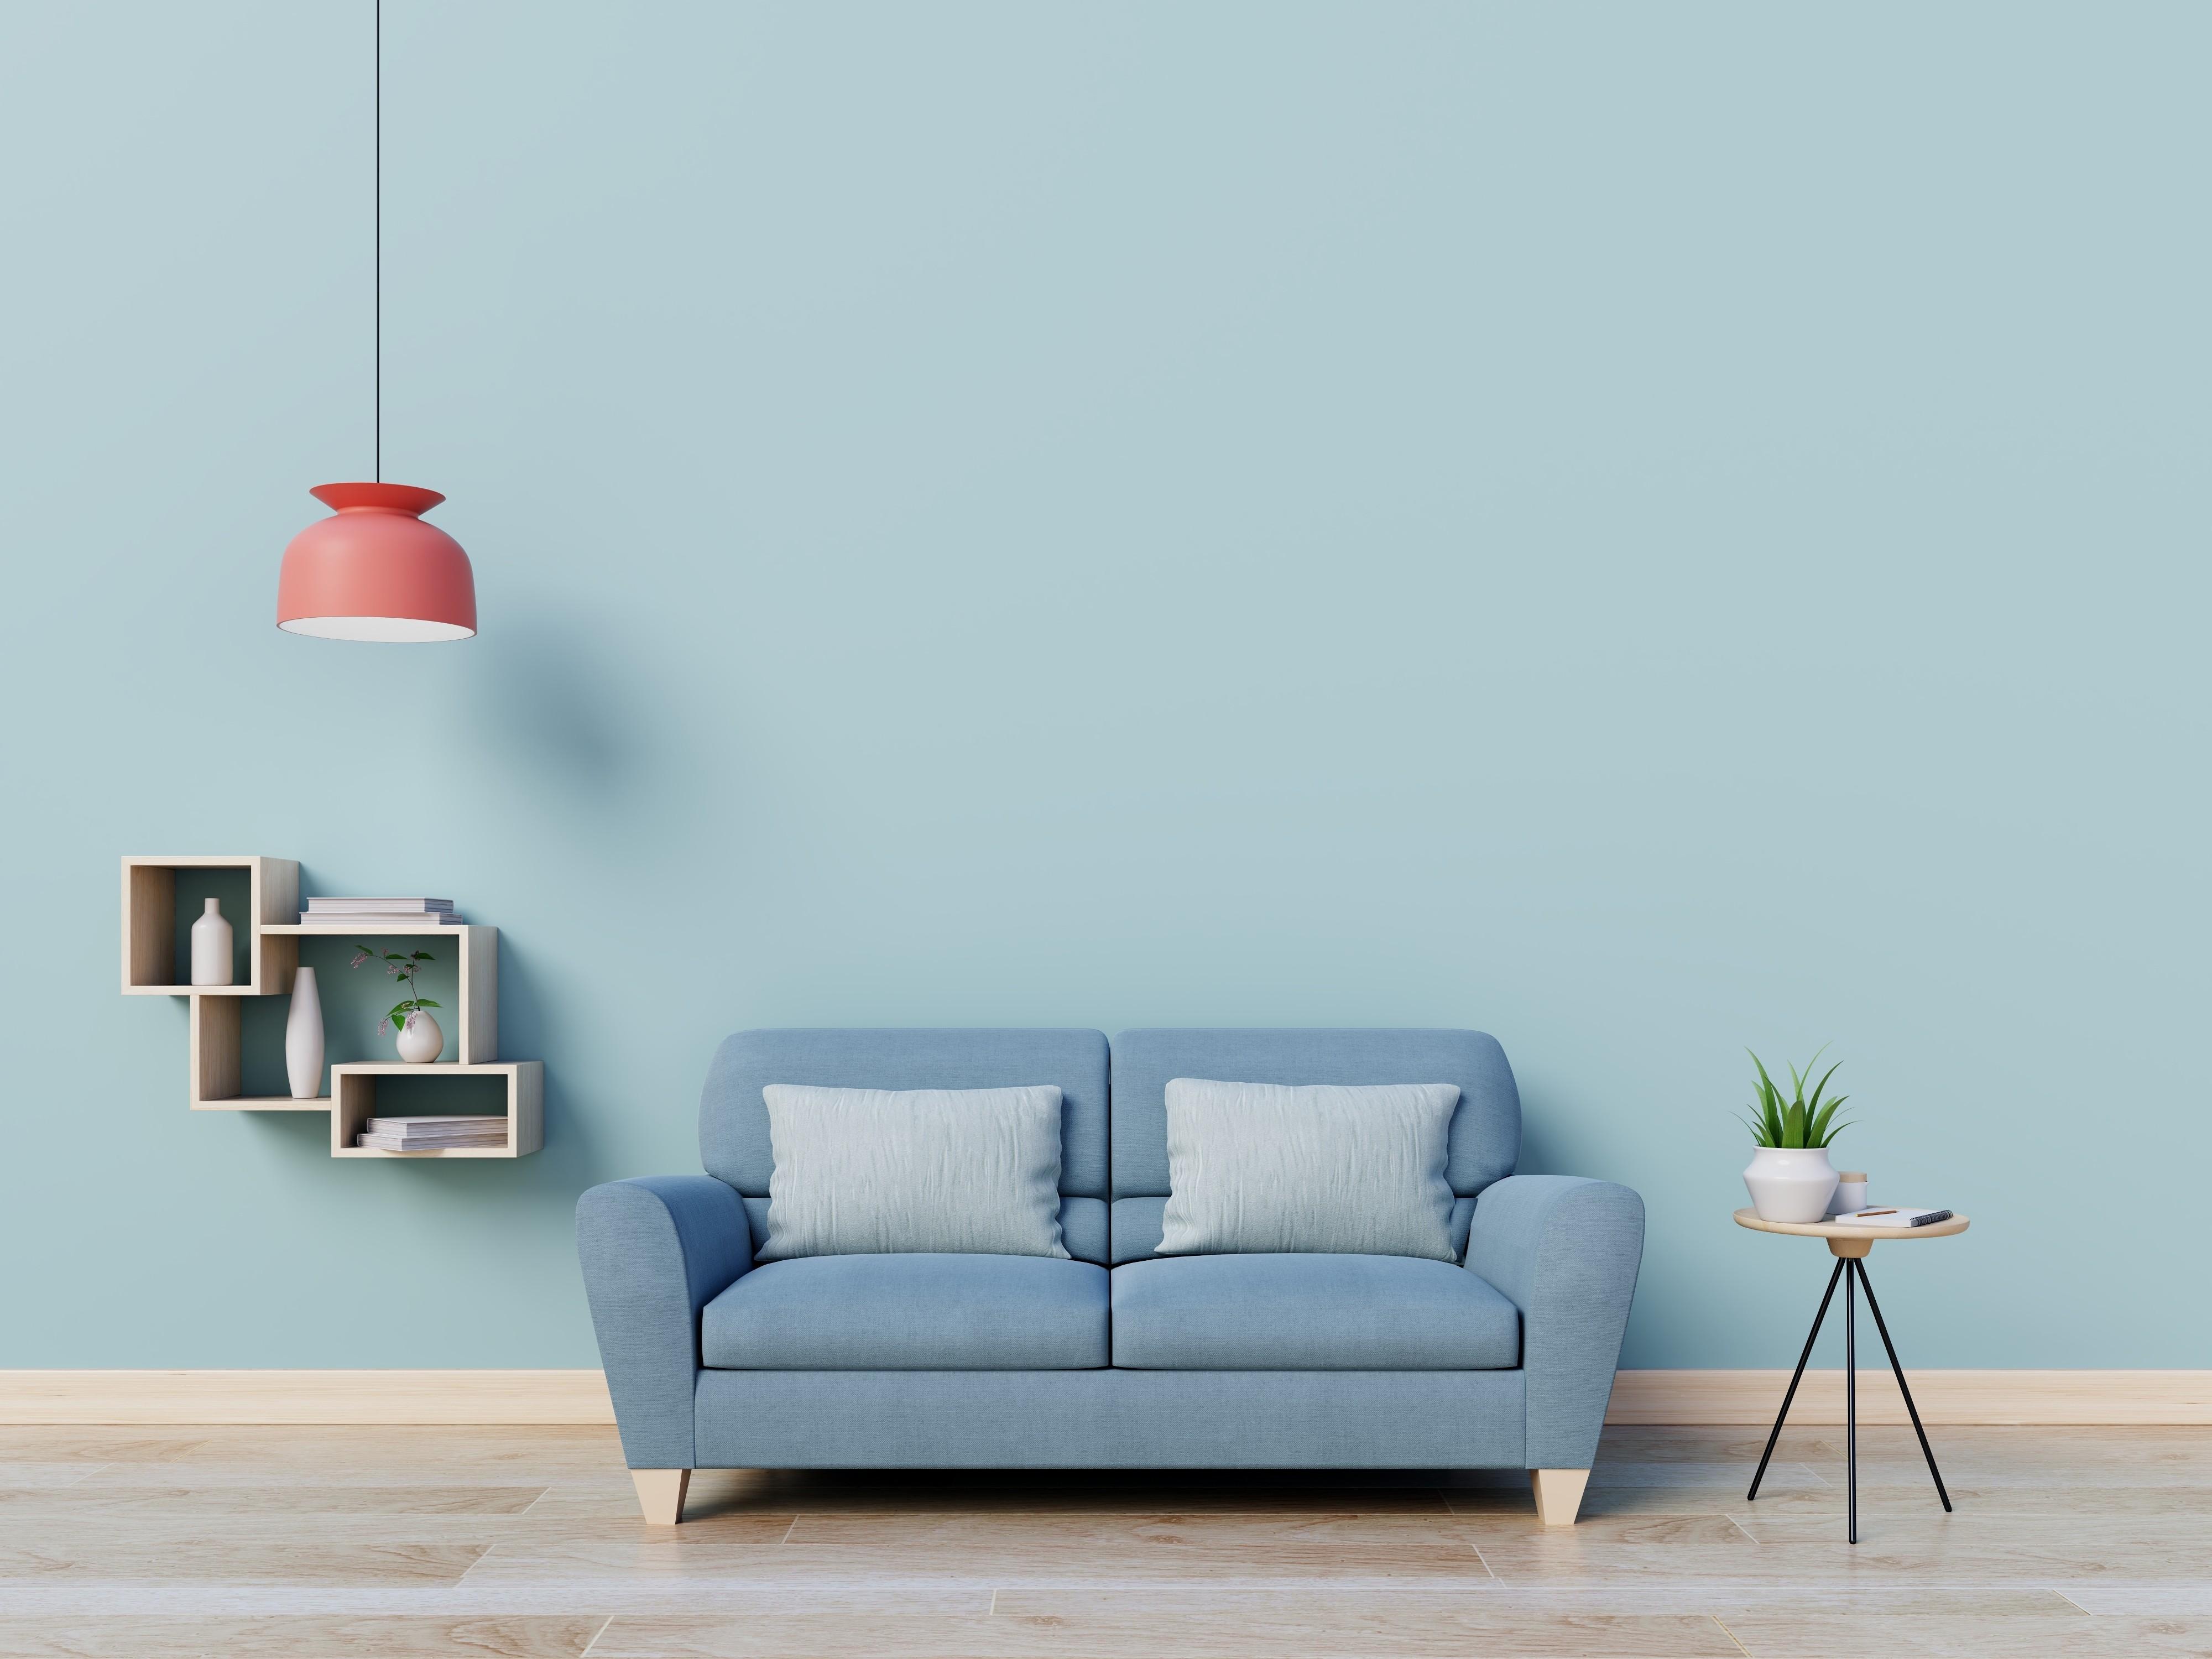 Furniture Row Mishawaka Indiana Arrivalguides Com